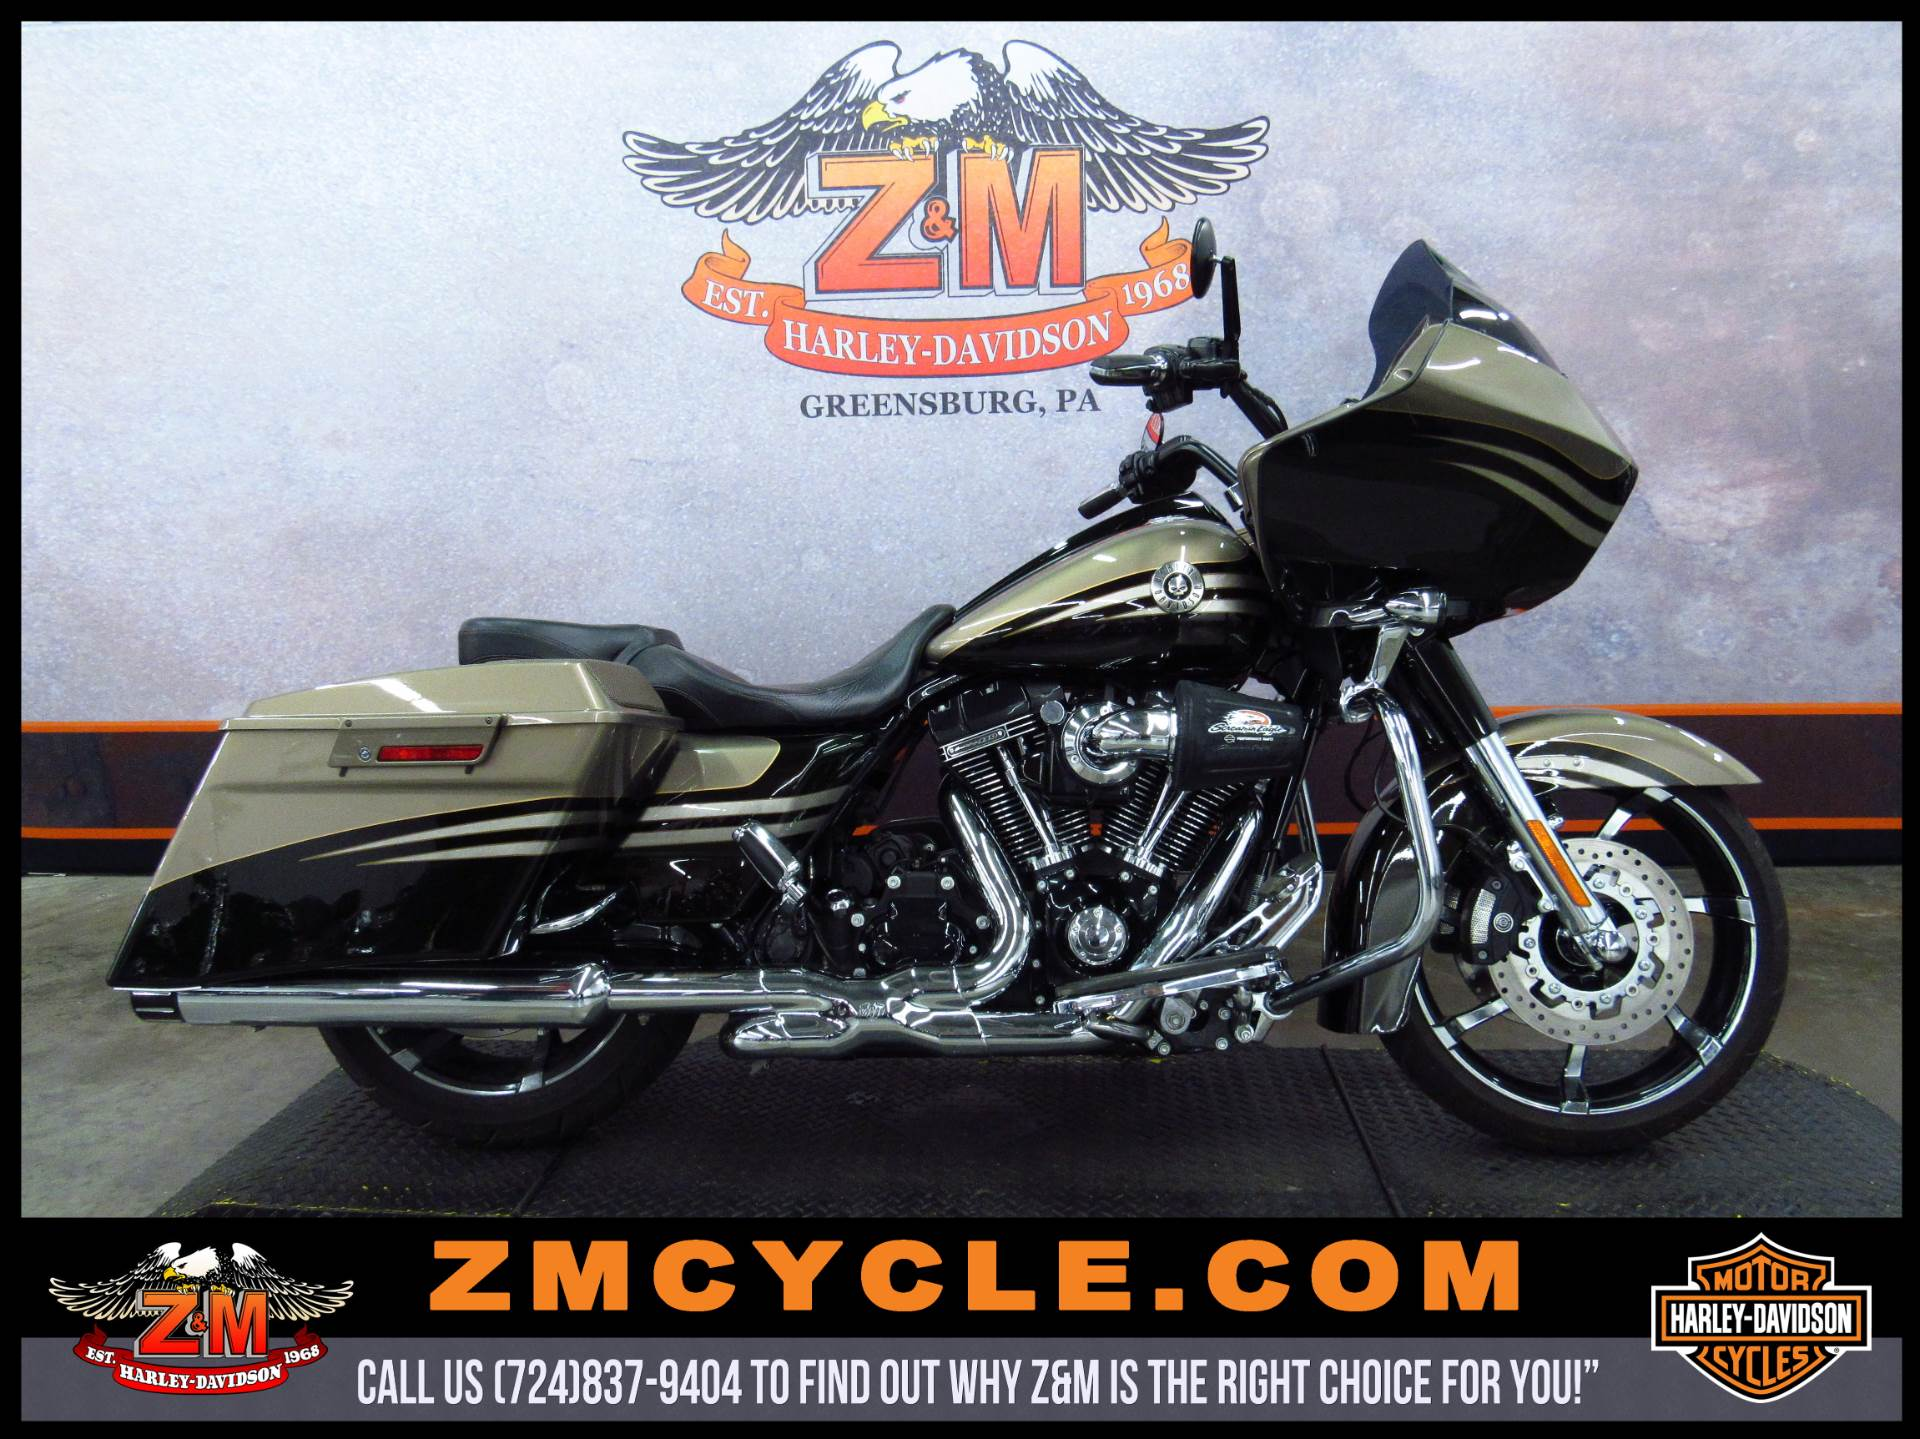 2013 Harley-Davidson CVO Road Glide Custom 1